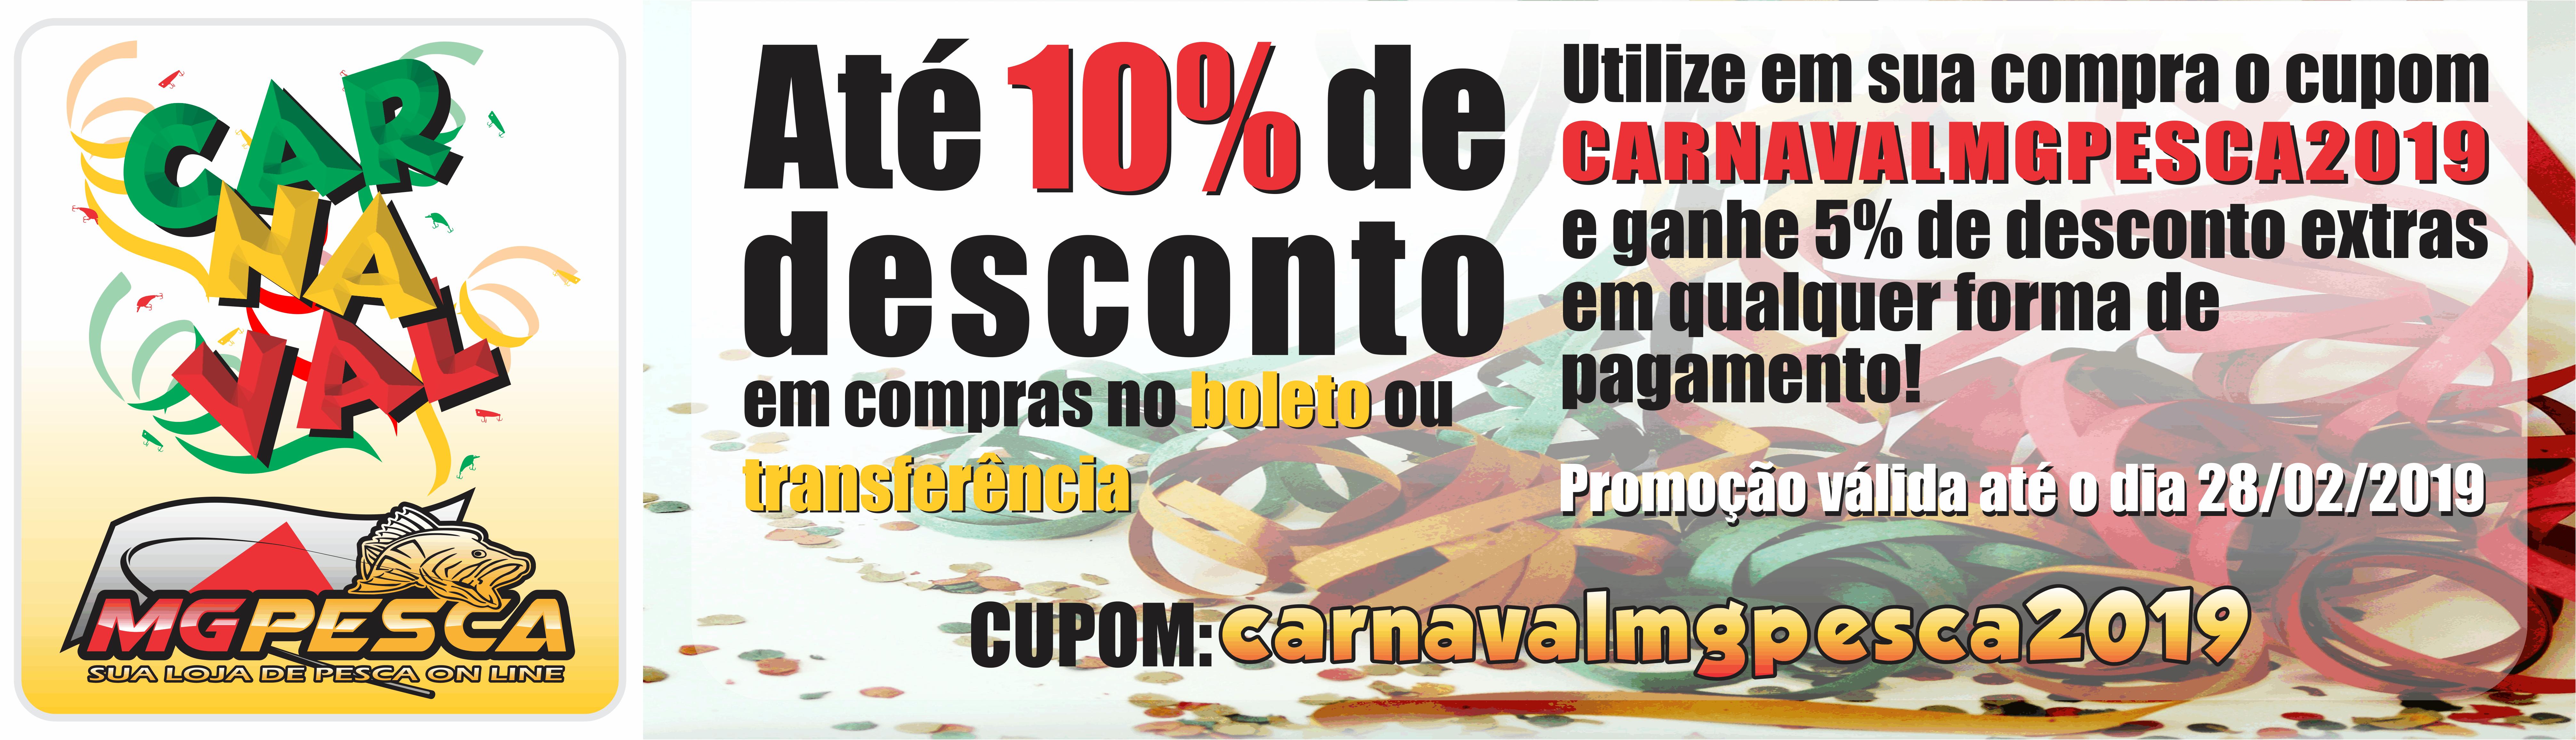 PROMOÇÃO CARNAVALMGPECA2019